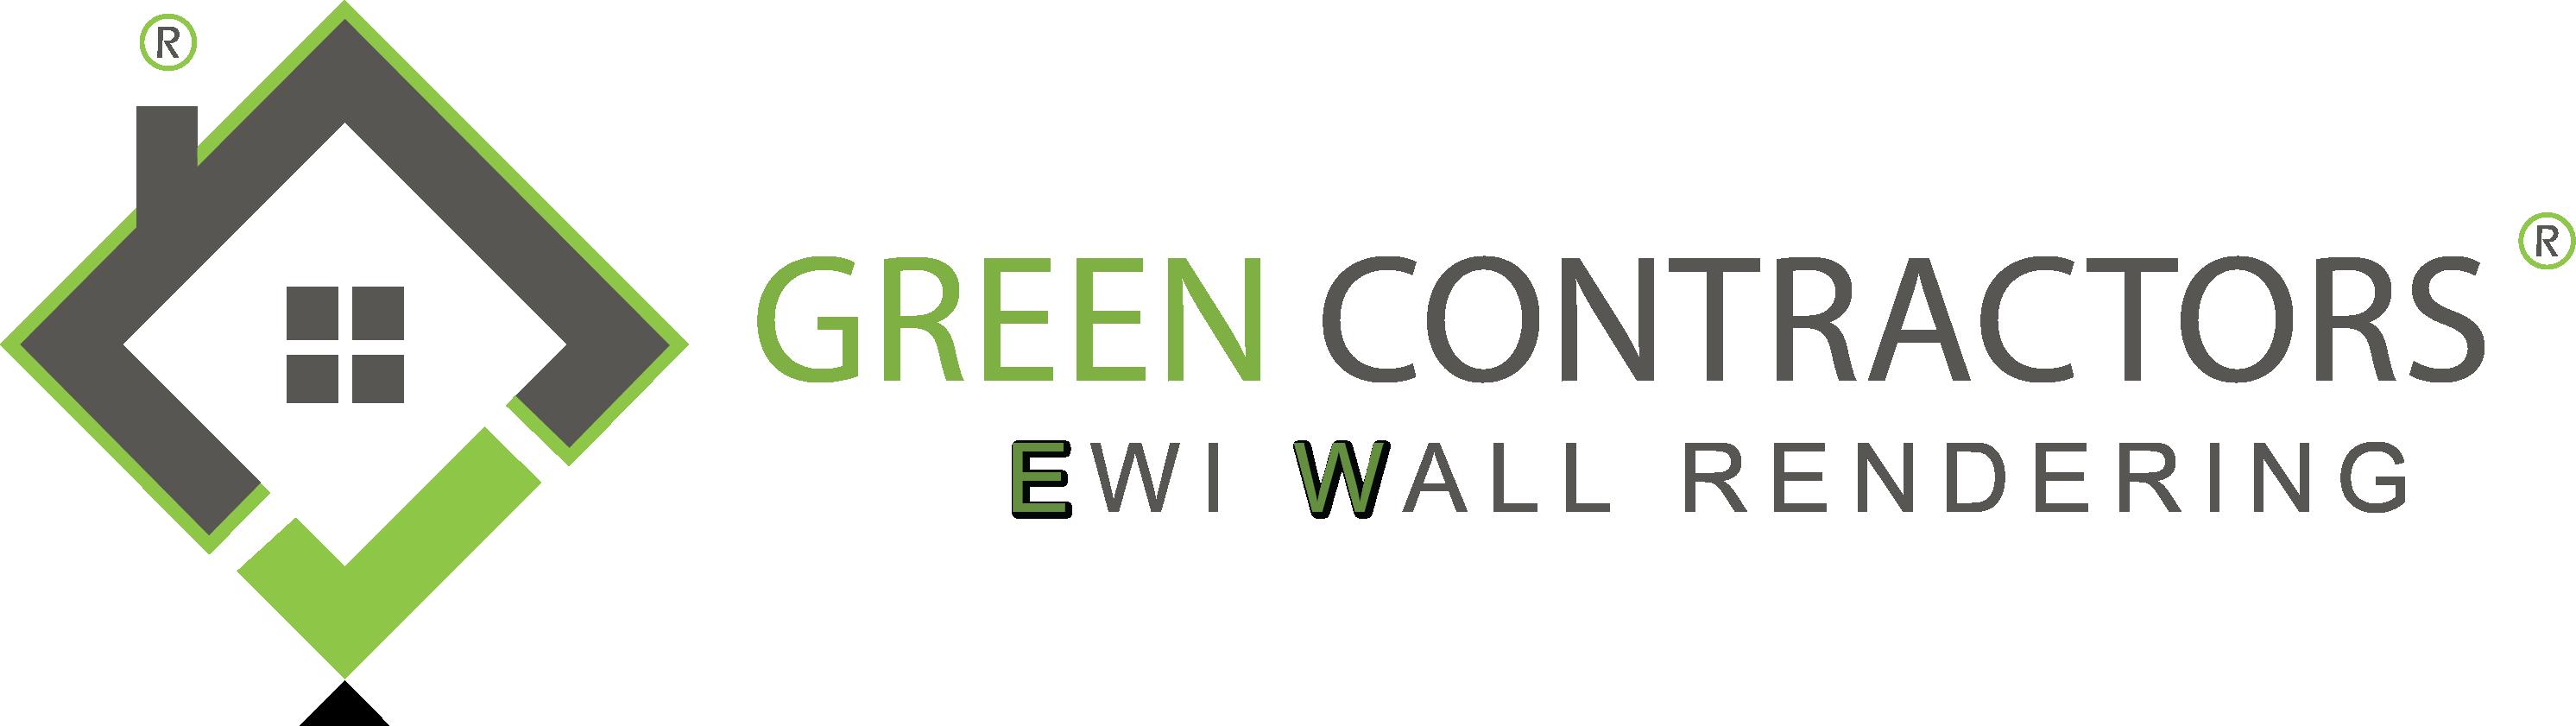 Green Contractors